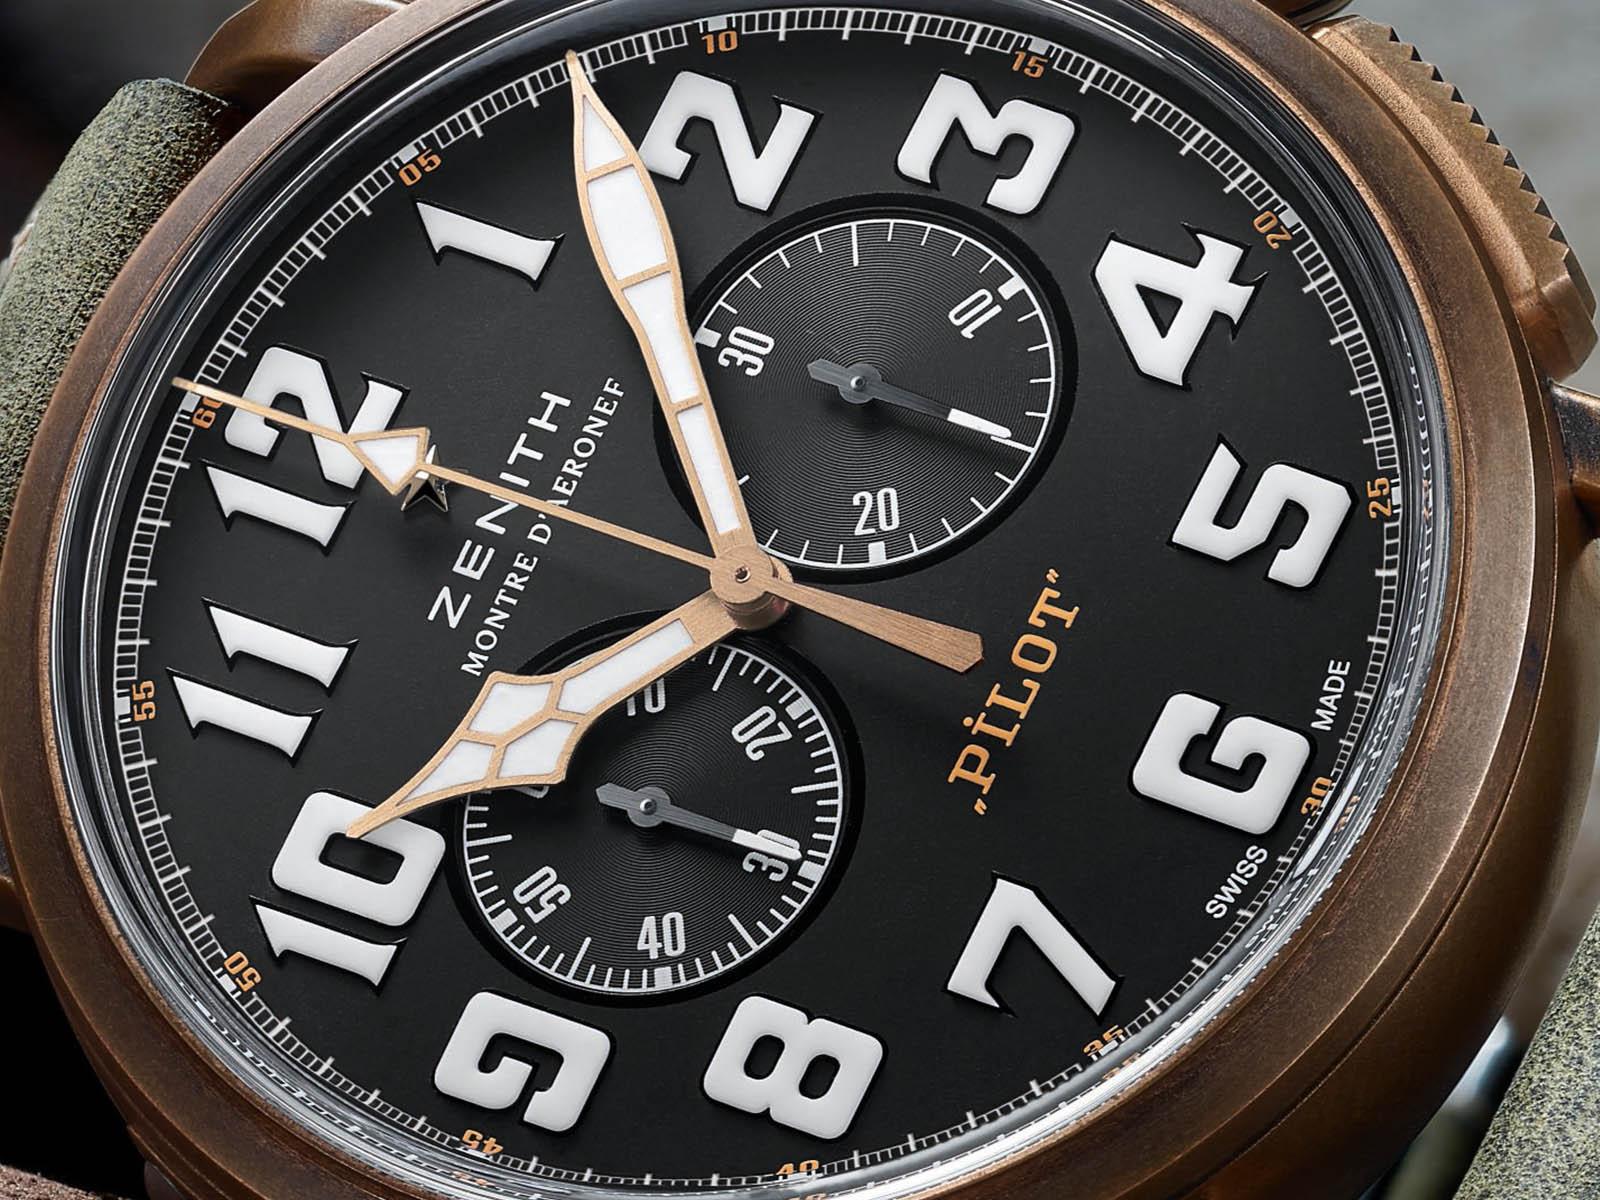 Zenith-Heritage-Pilot-Extra-Special-Bronze-Chronograph-4.jpg